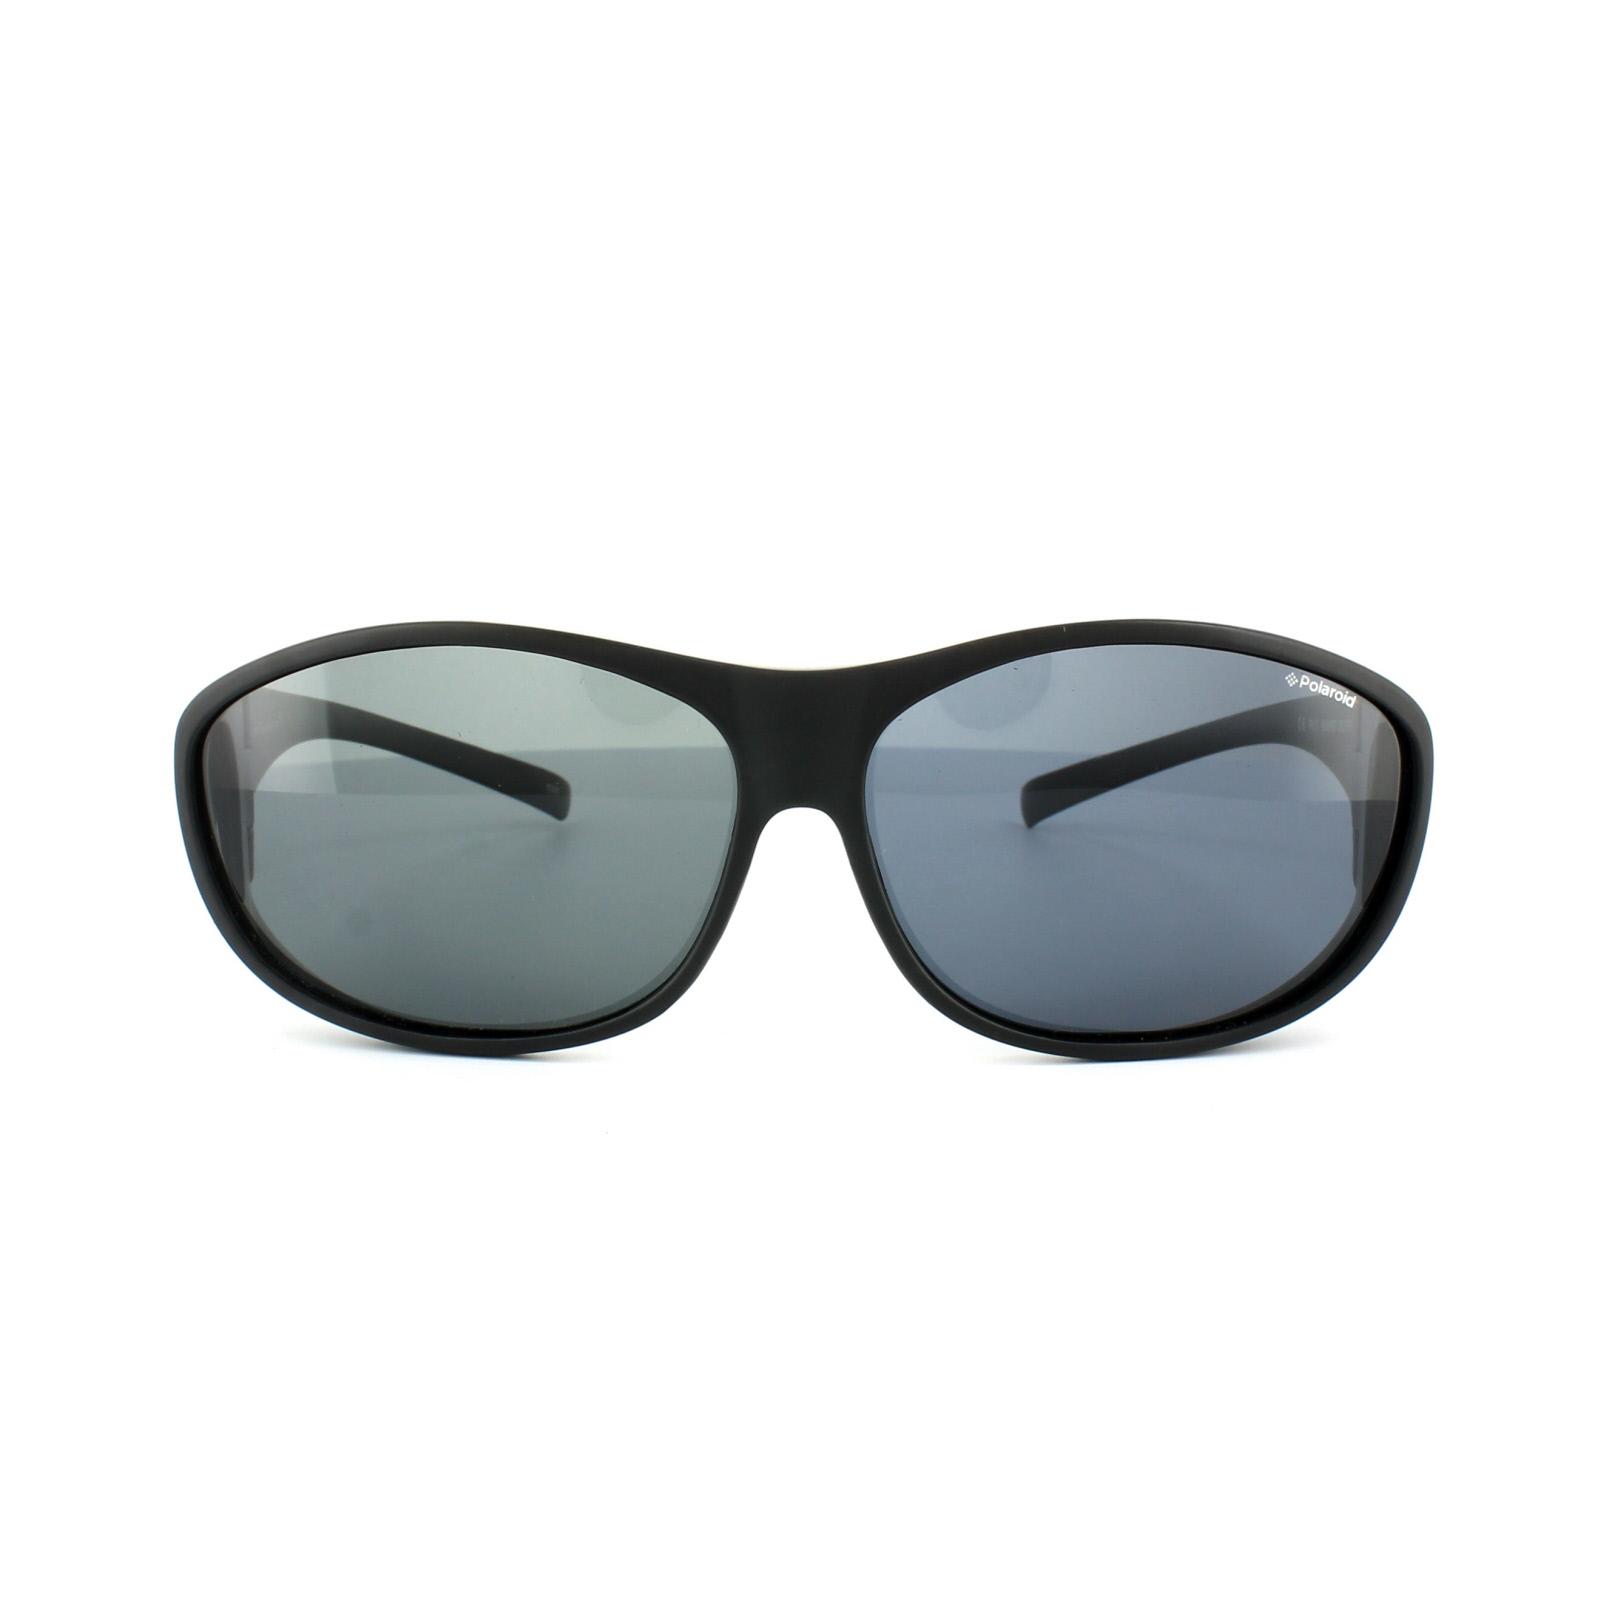 Cheap Polaroid Suncovers Fitover 9005 S Sunglasses - Discounted ... 0924f565ef